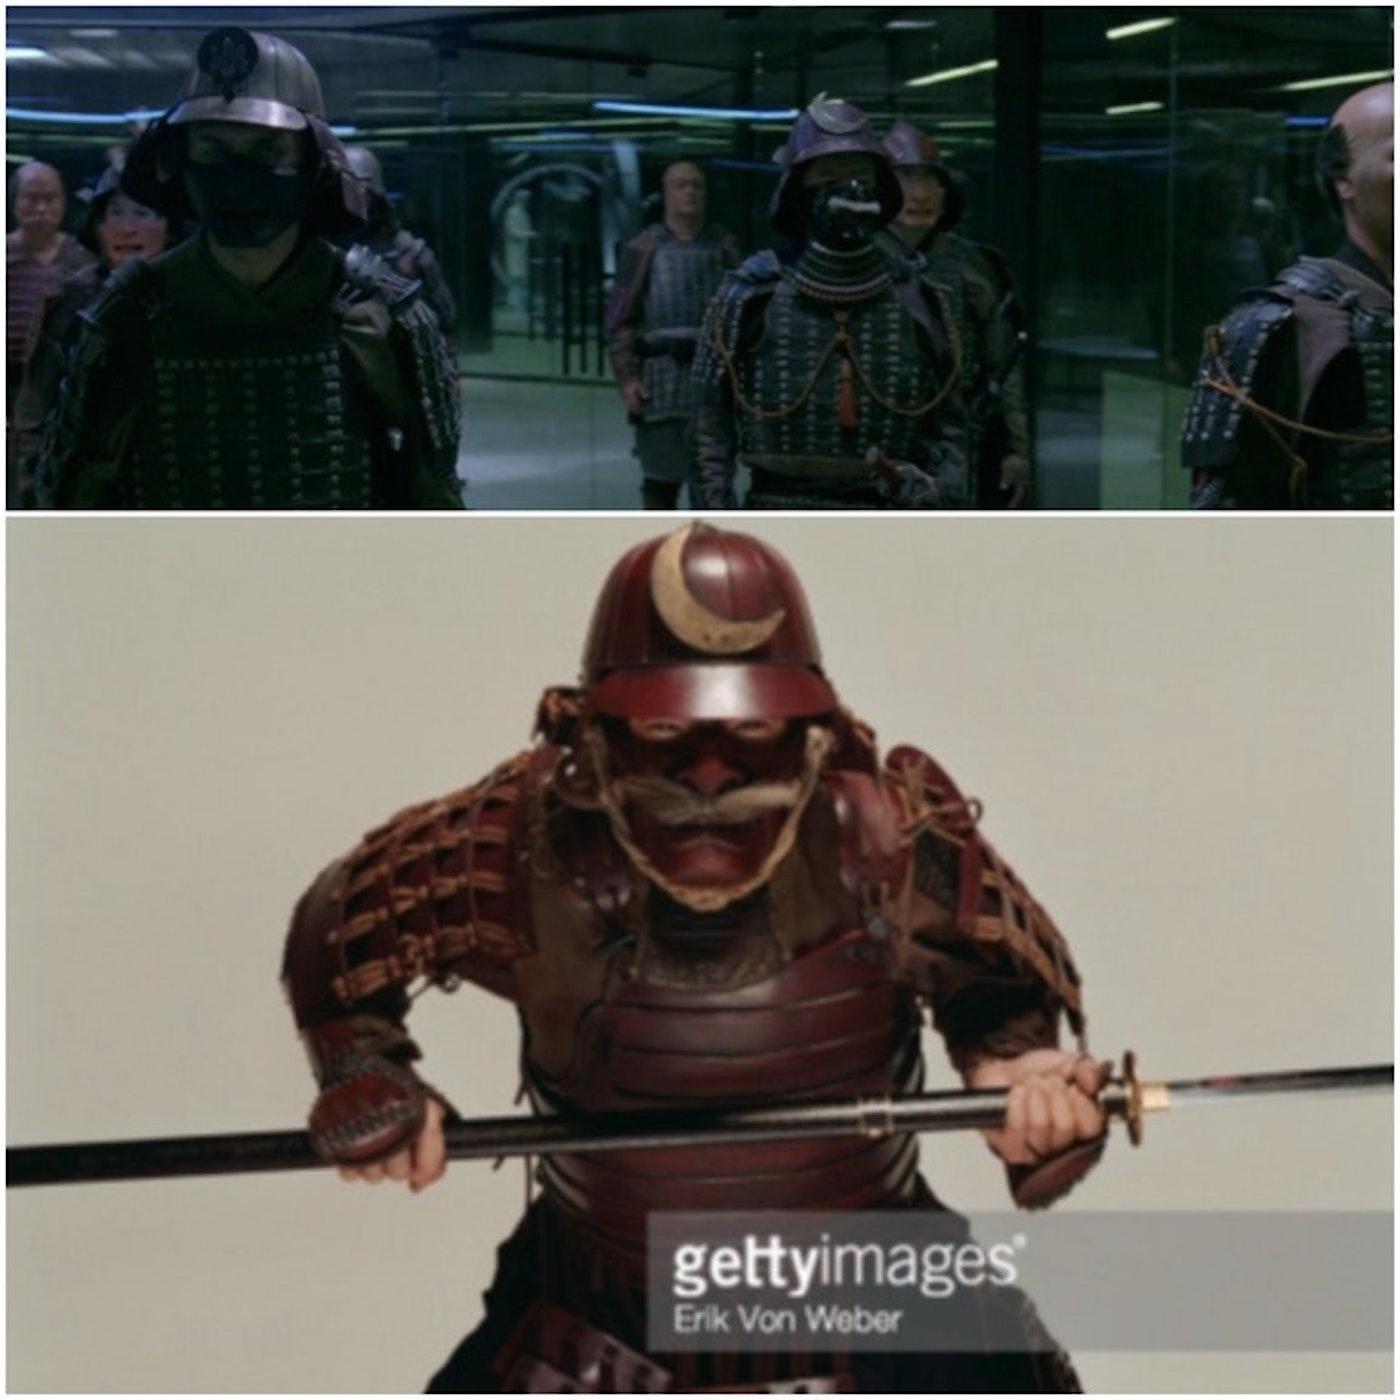 Erik von Weber Samurai Comparison